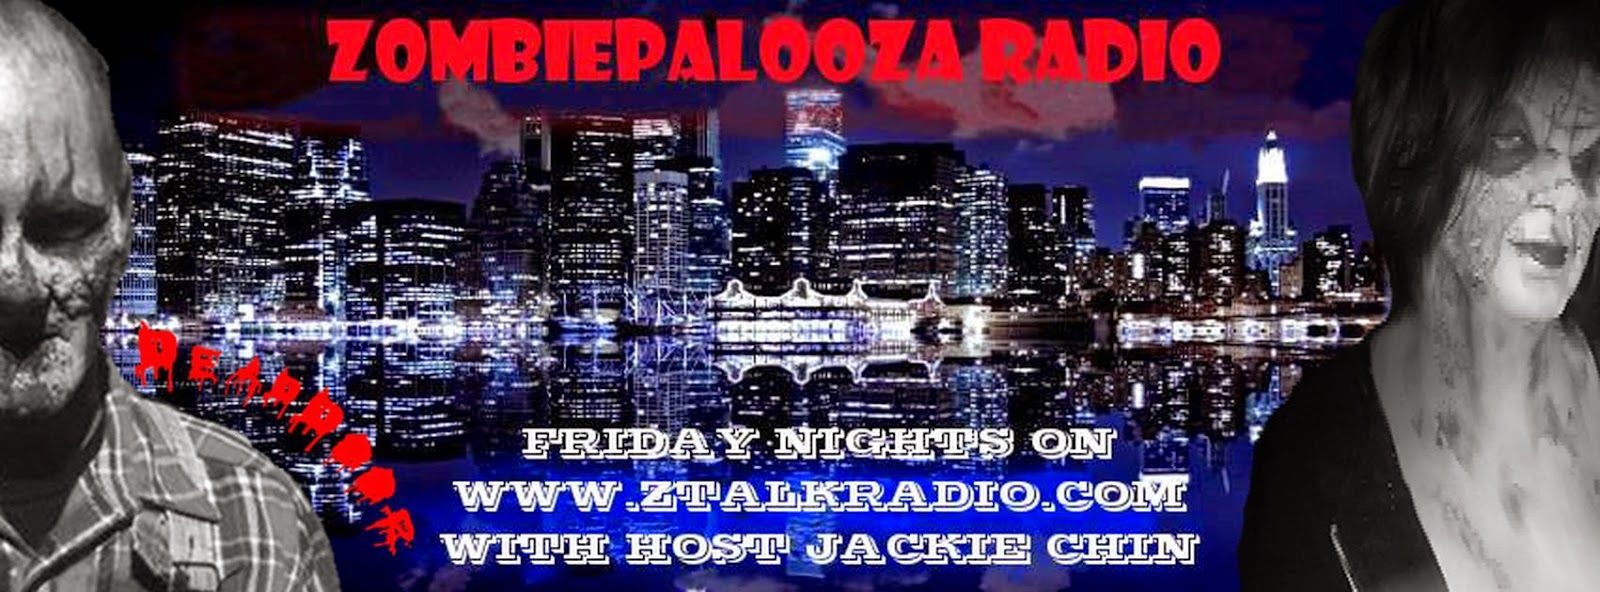 Zombob's Zombie News and Reviews: Tonight on Zombiepalooza Radio! 9/19/14